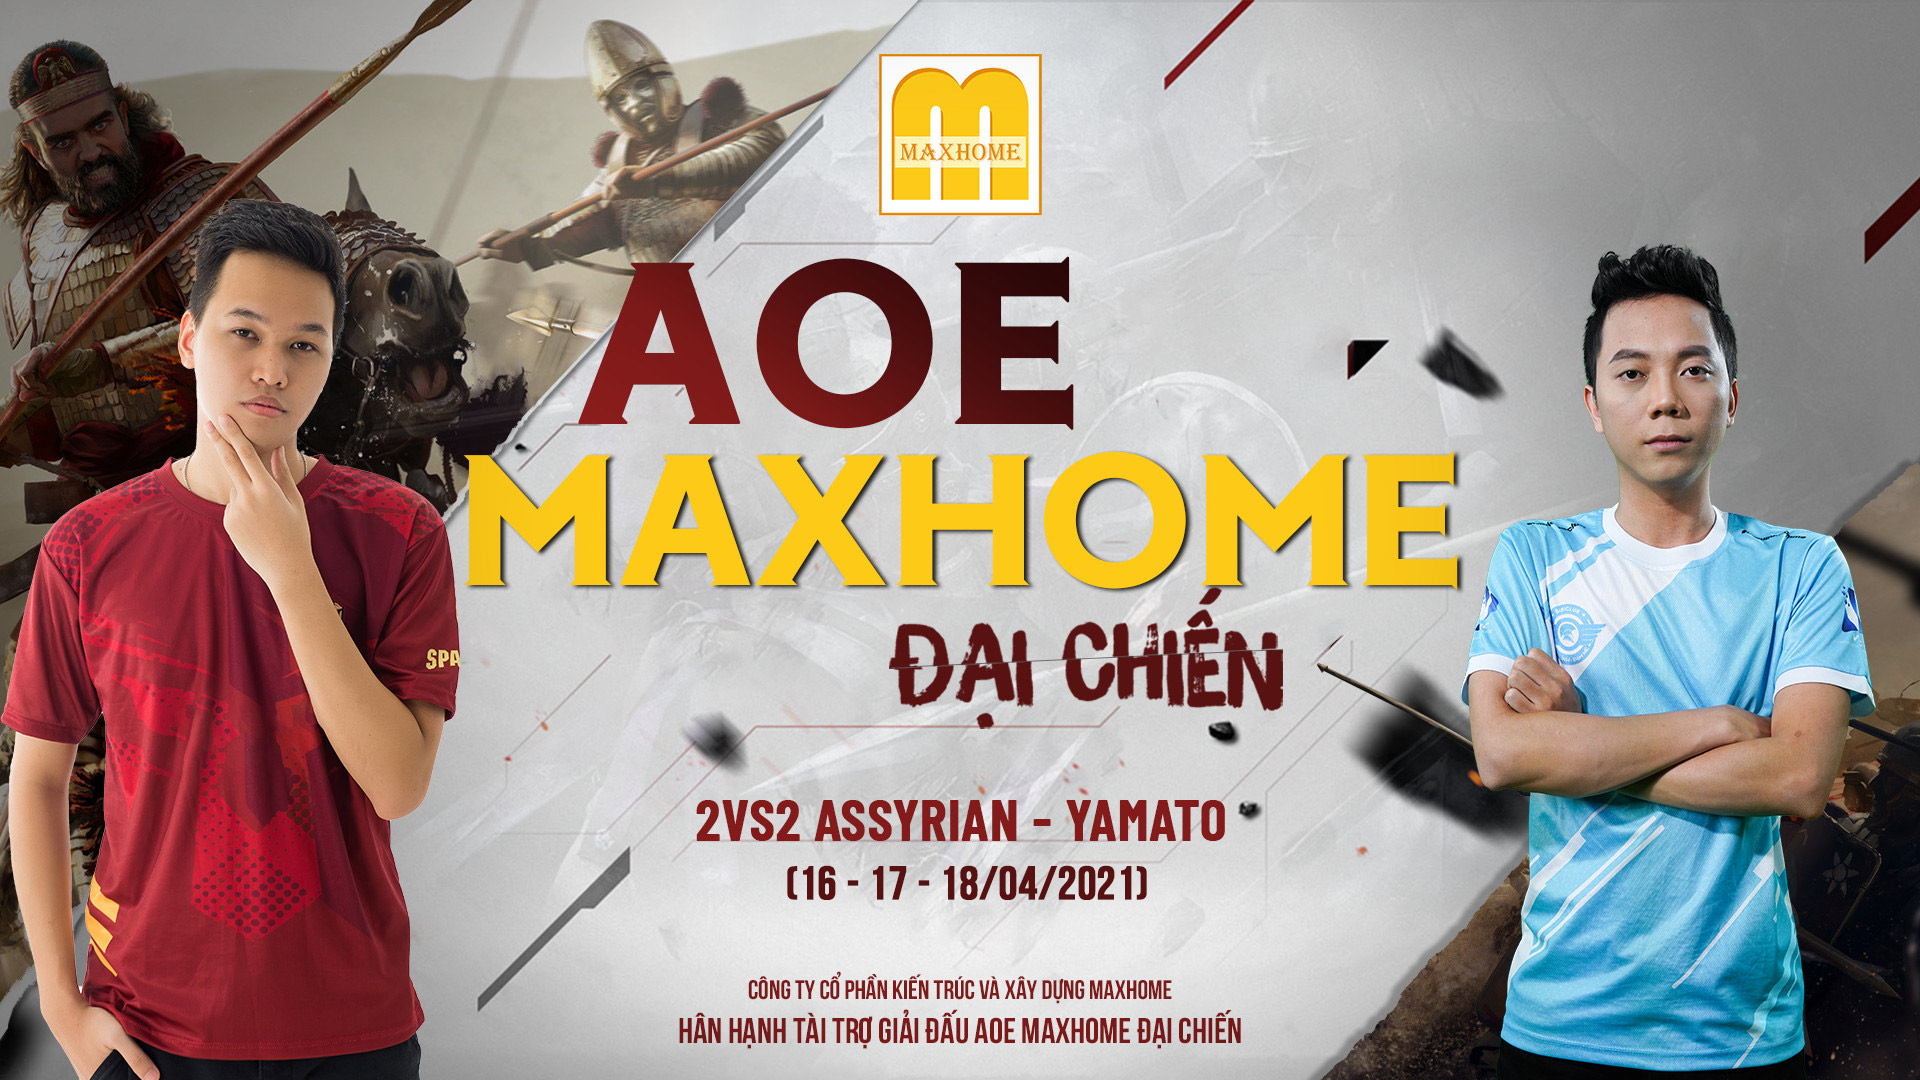 MaxHome AOE ĐẠI CHIẾN